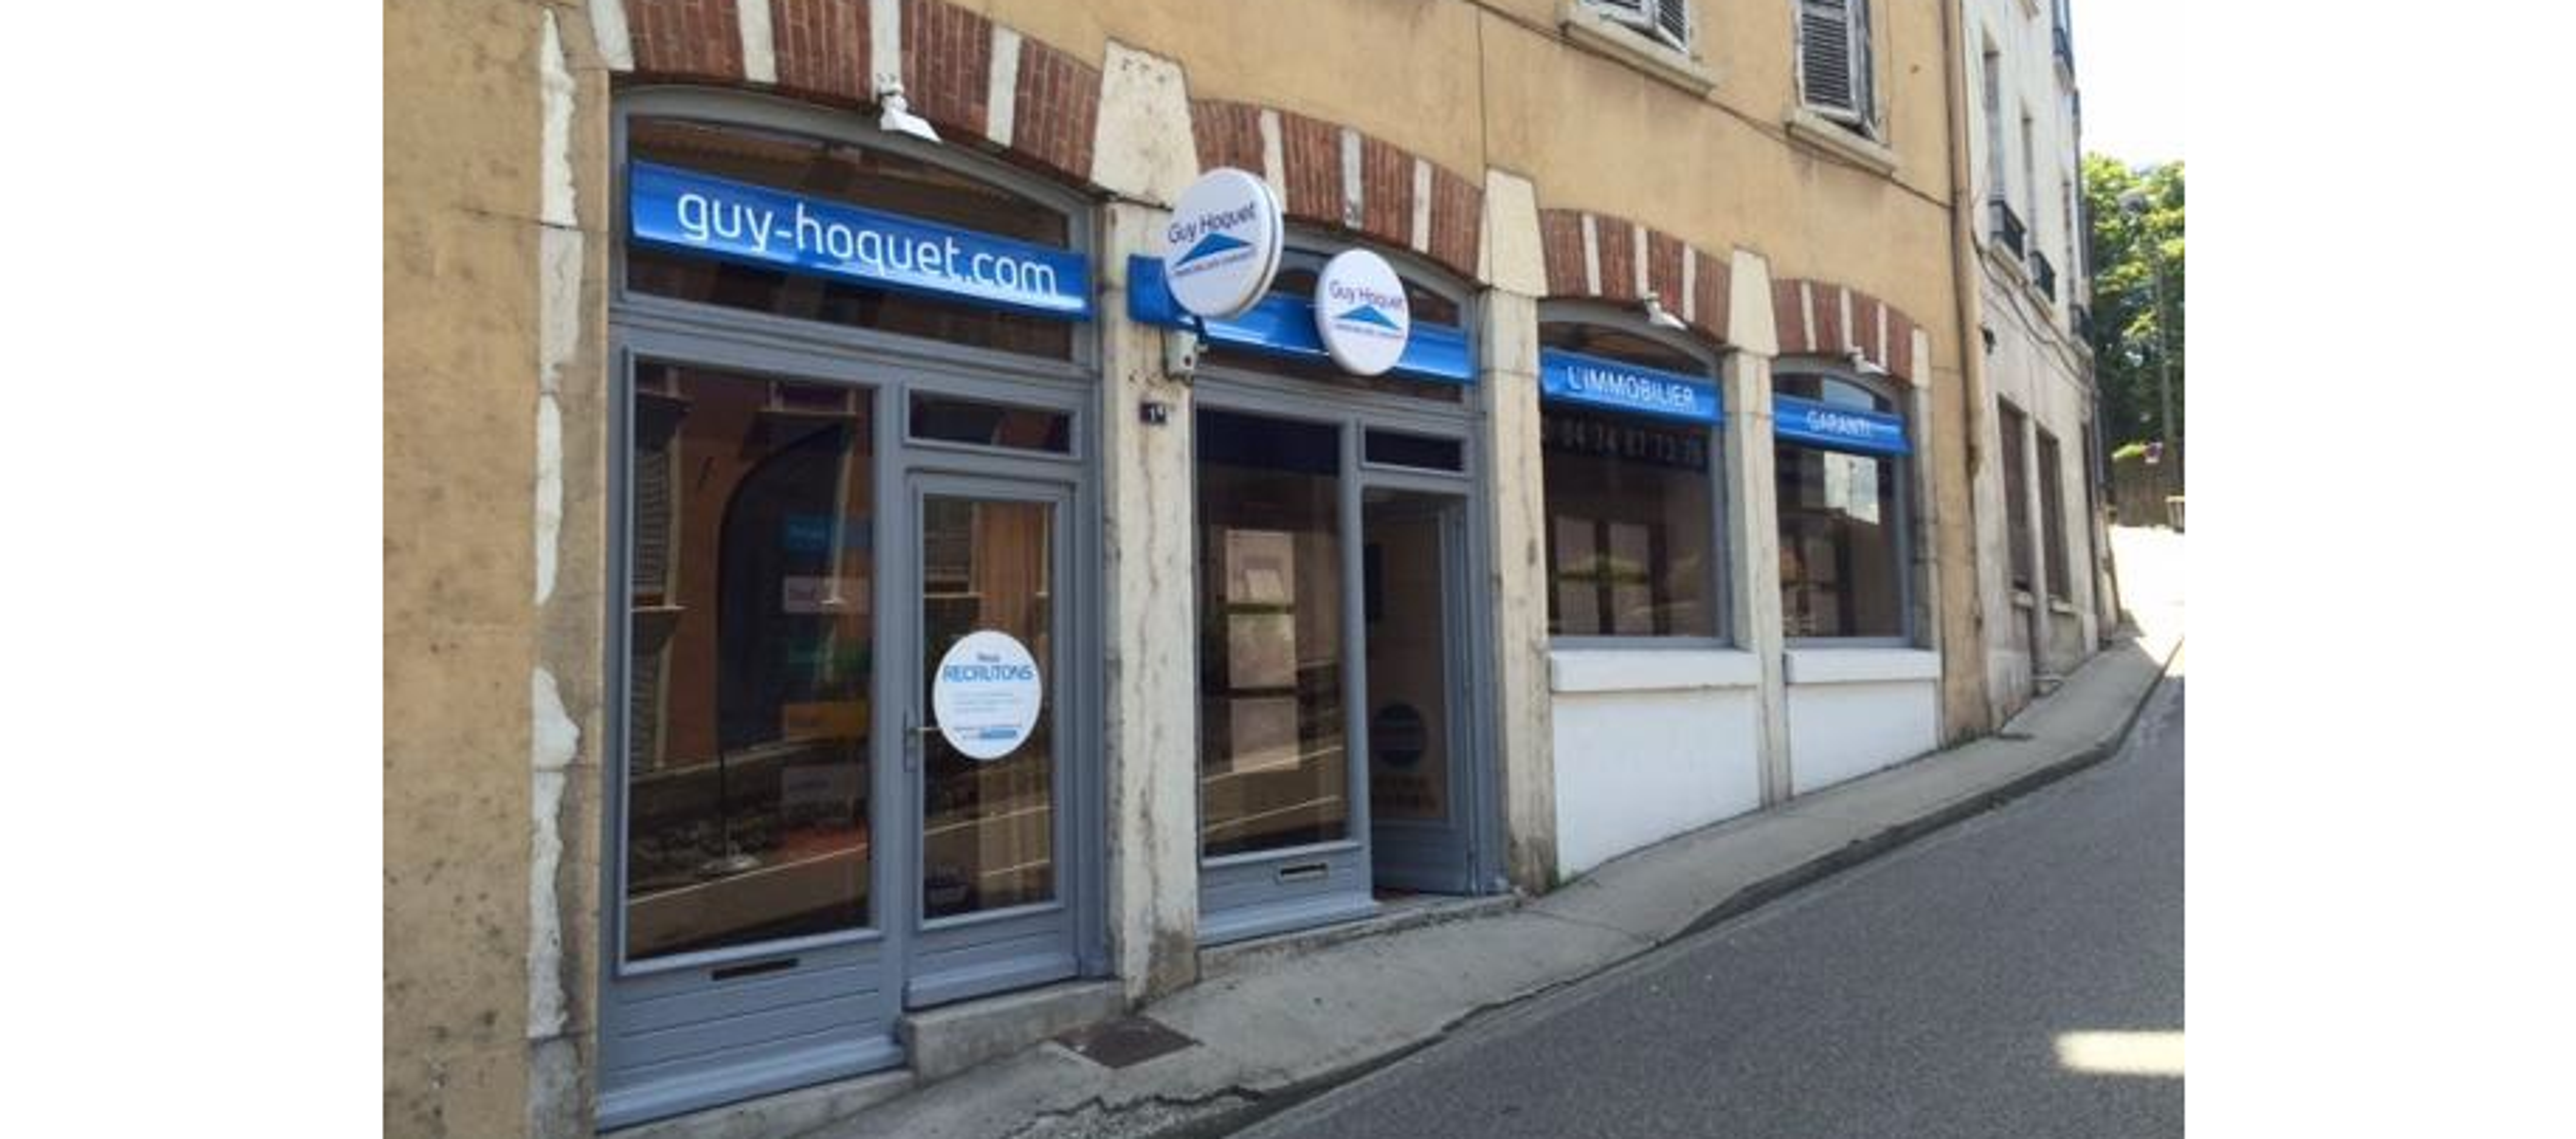 Agence Guy Hoquet VIENNE